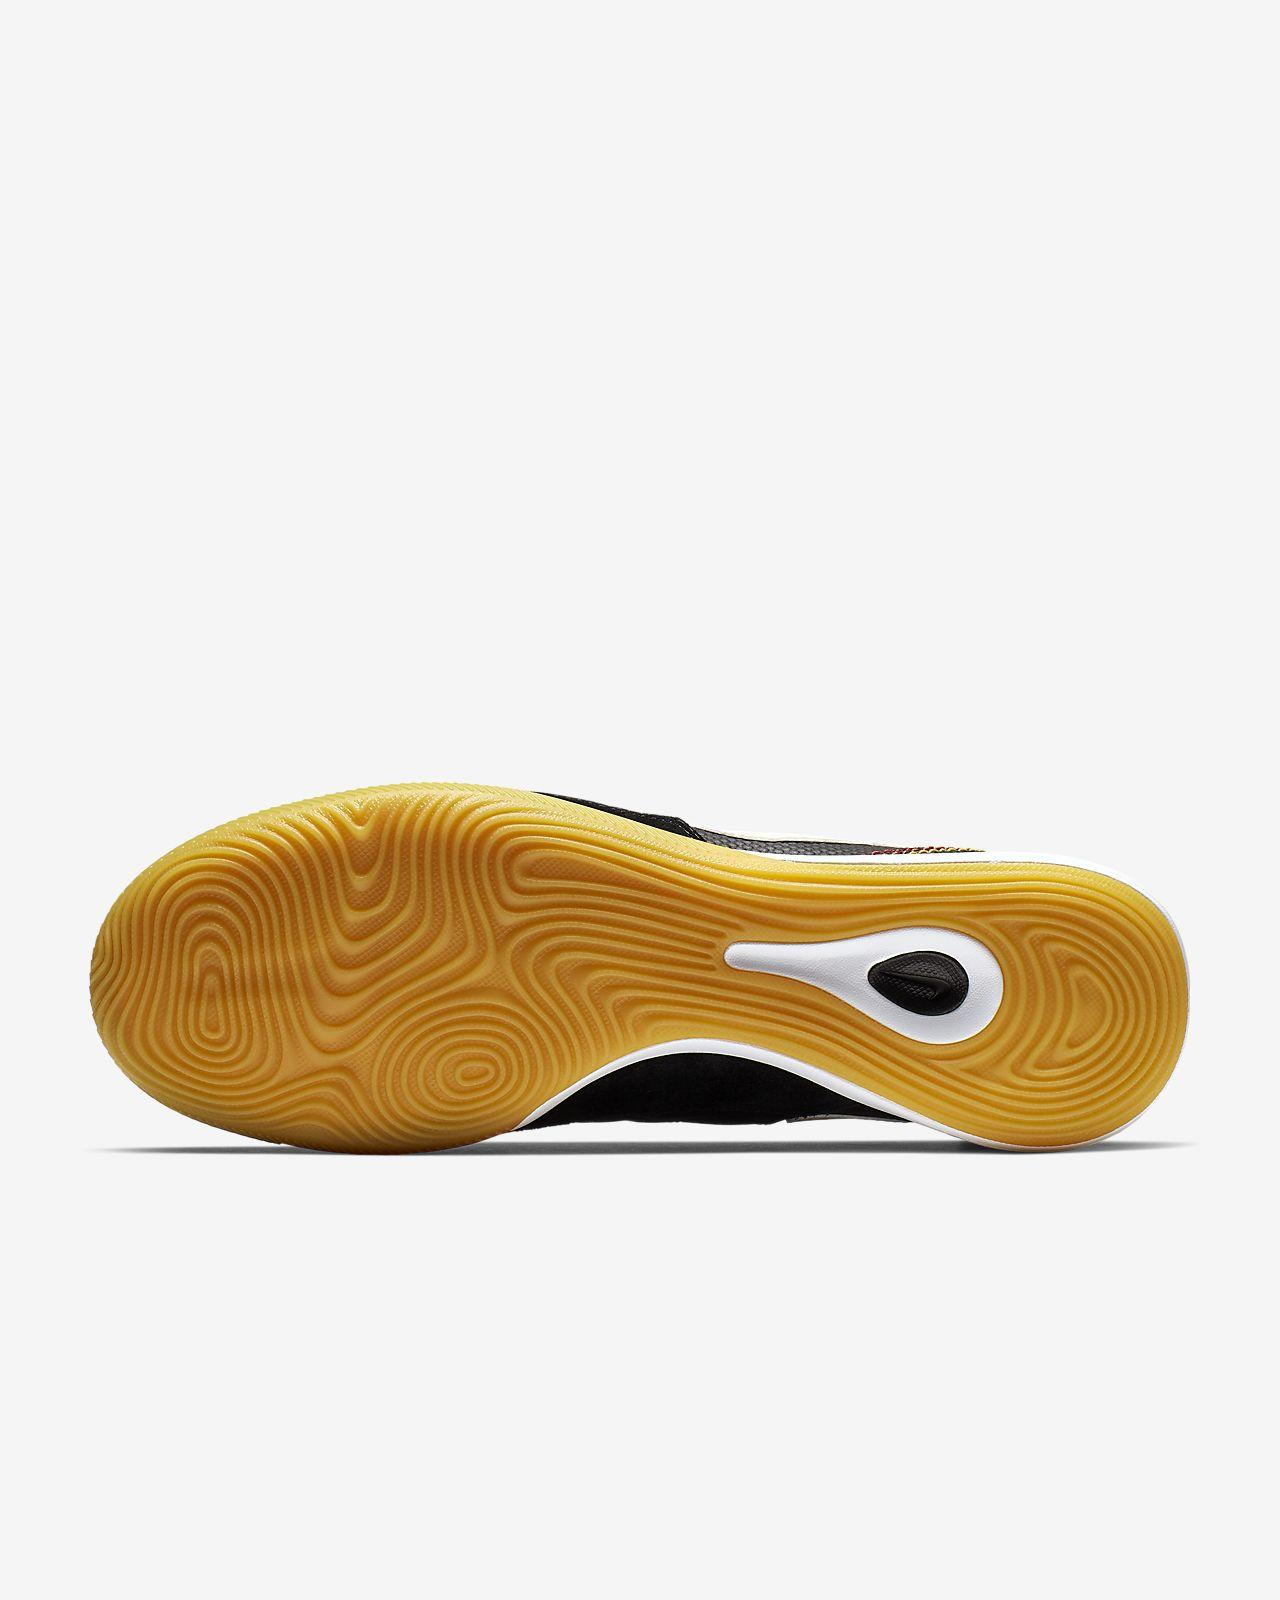 bd98eb3e45a Nike TiempoX Lunar Legend VII Pro 10R Indoor Court Football Shoe ...